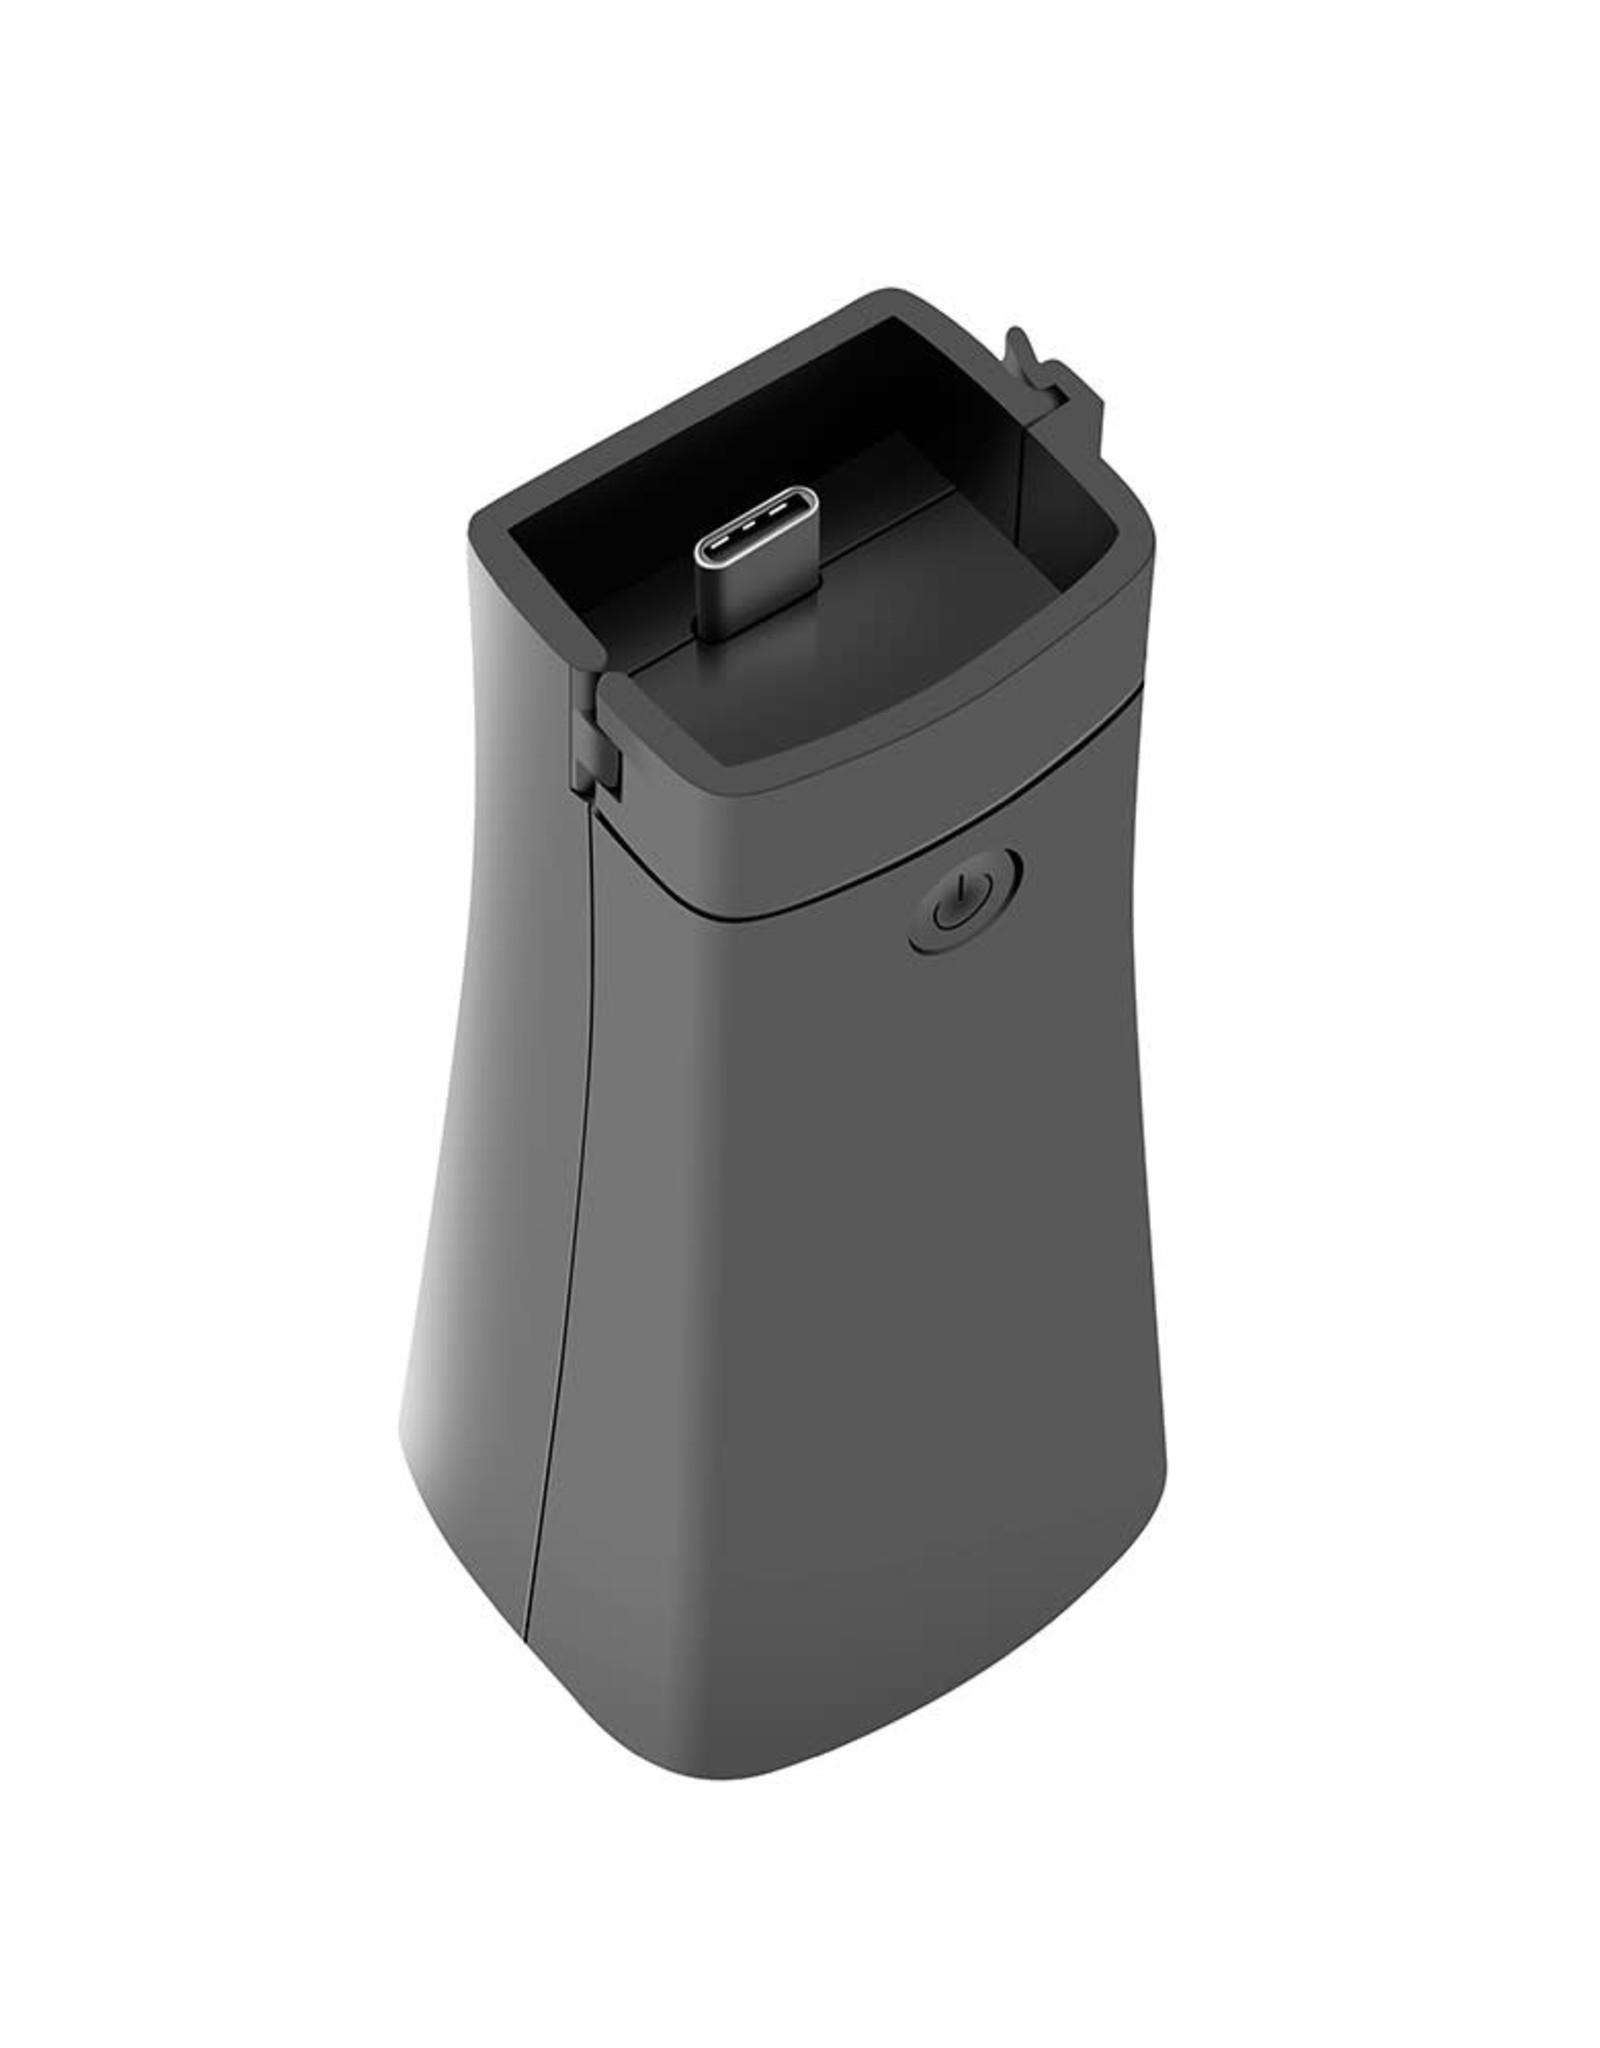 Dji DJI OSMO Pocket 4000mAh Portable Power Bank